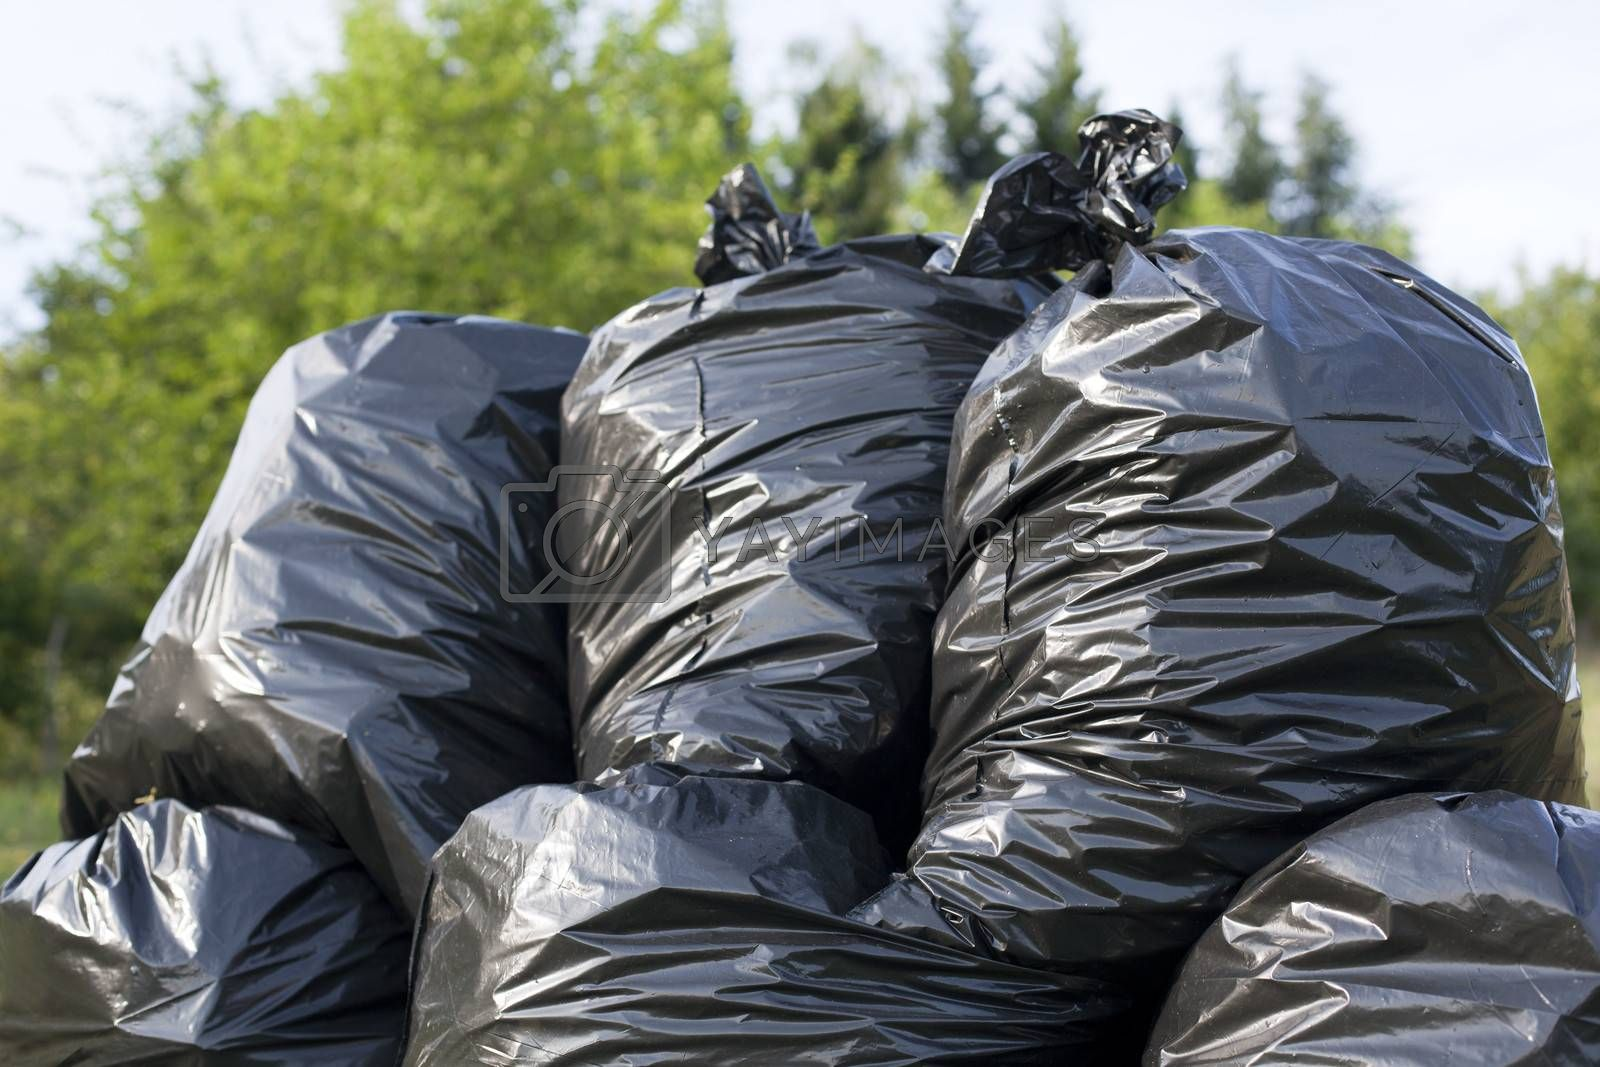 A pile of black garbage bags